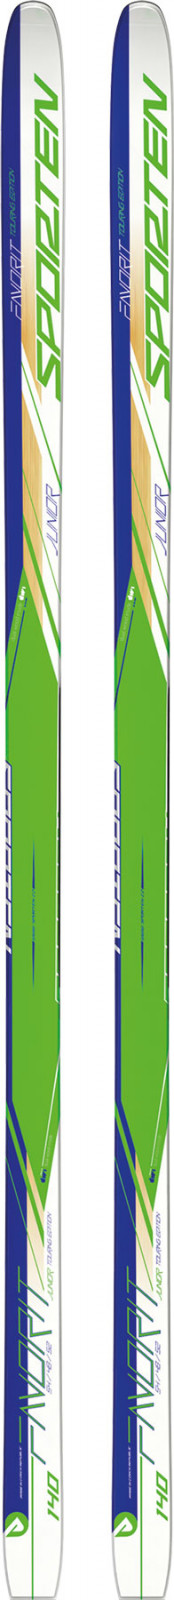 Sporten Favorit Jr. Boy 100 - 130 cm - řezaný protismyk